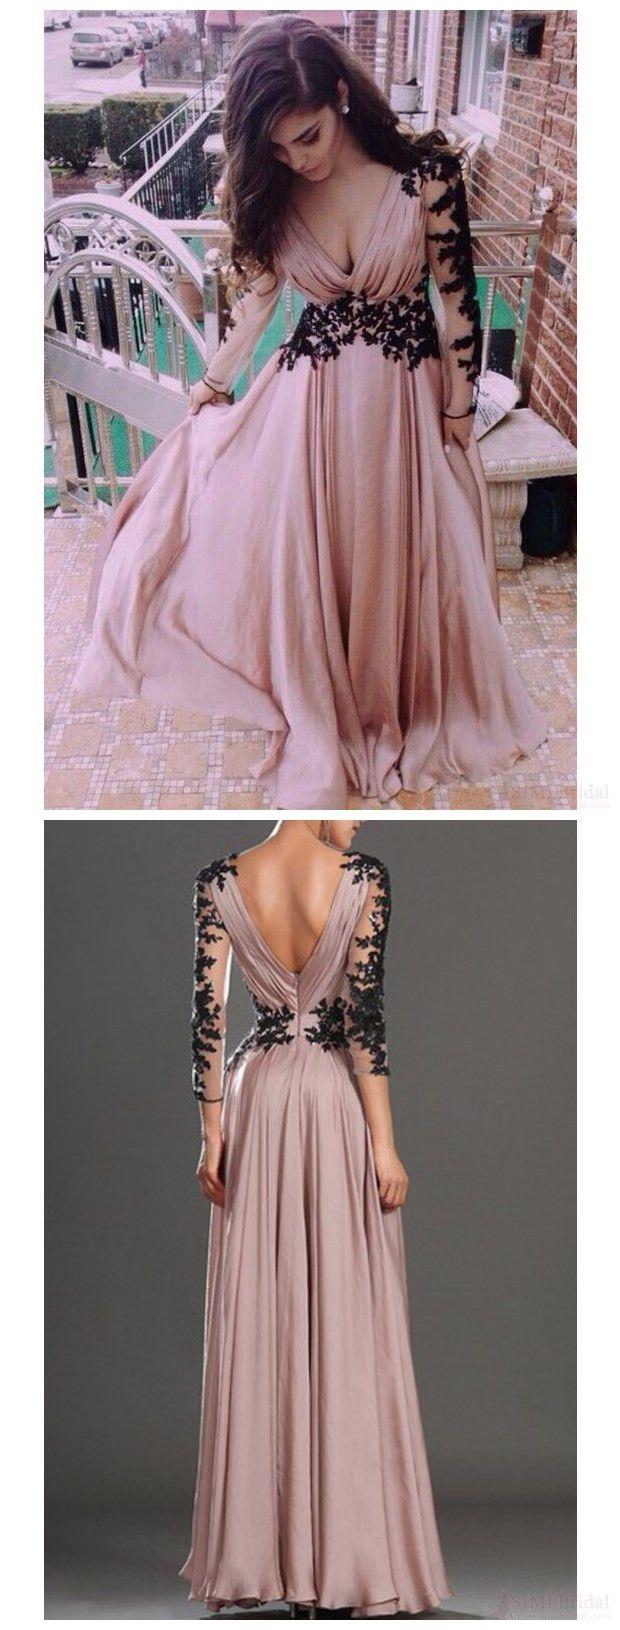 Vneck prom dressessexy prom dressprompromdresses simibridal